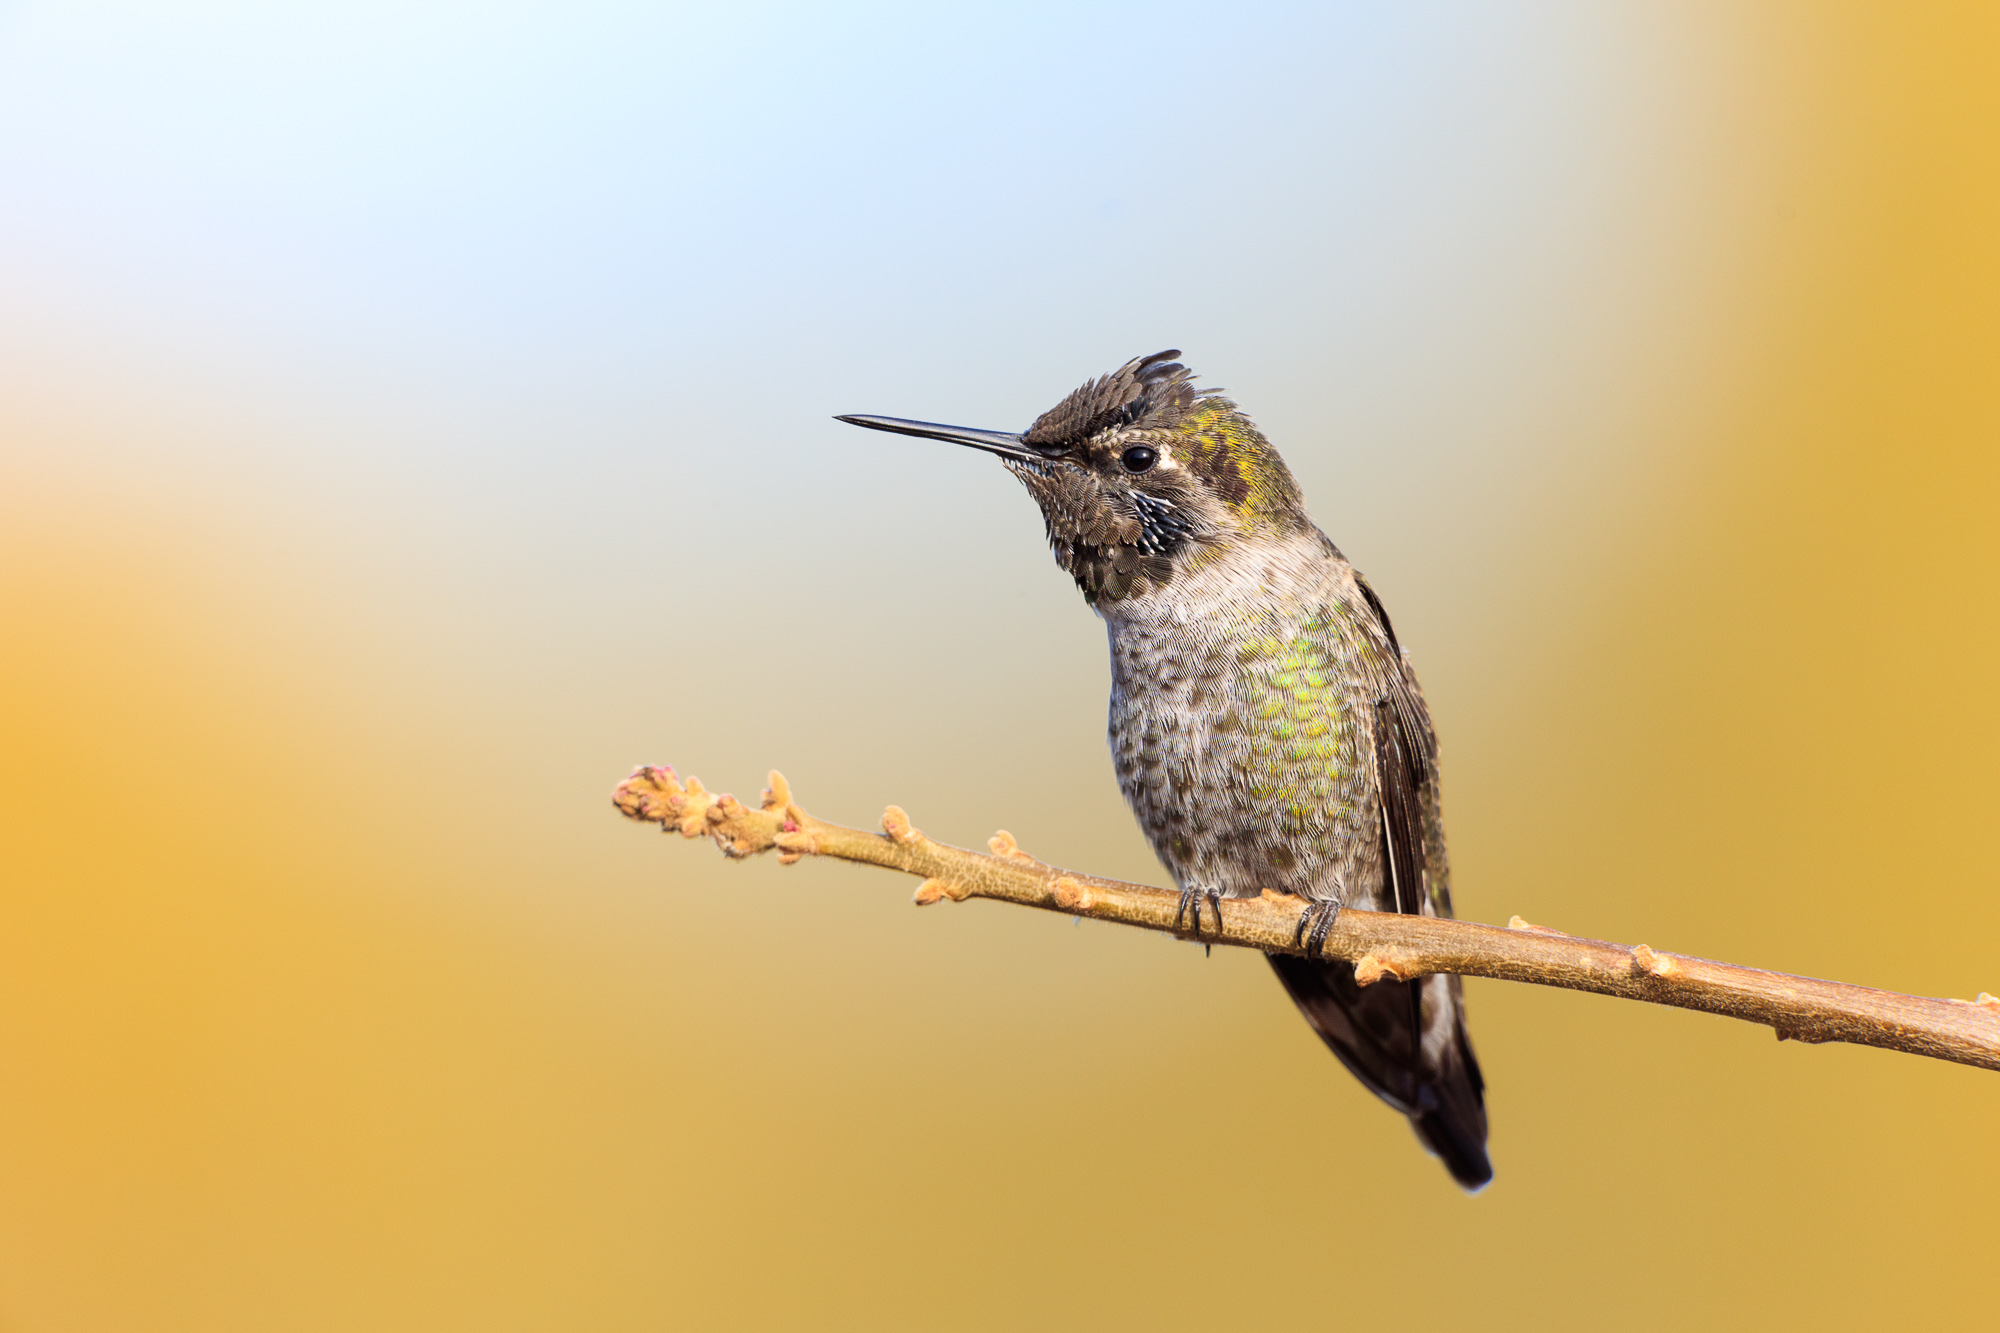 An anna's hummingbird perches on a thin branch, Belmont, CA